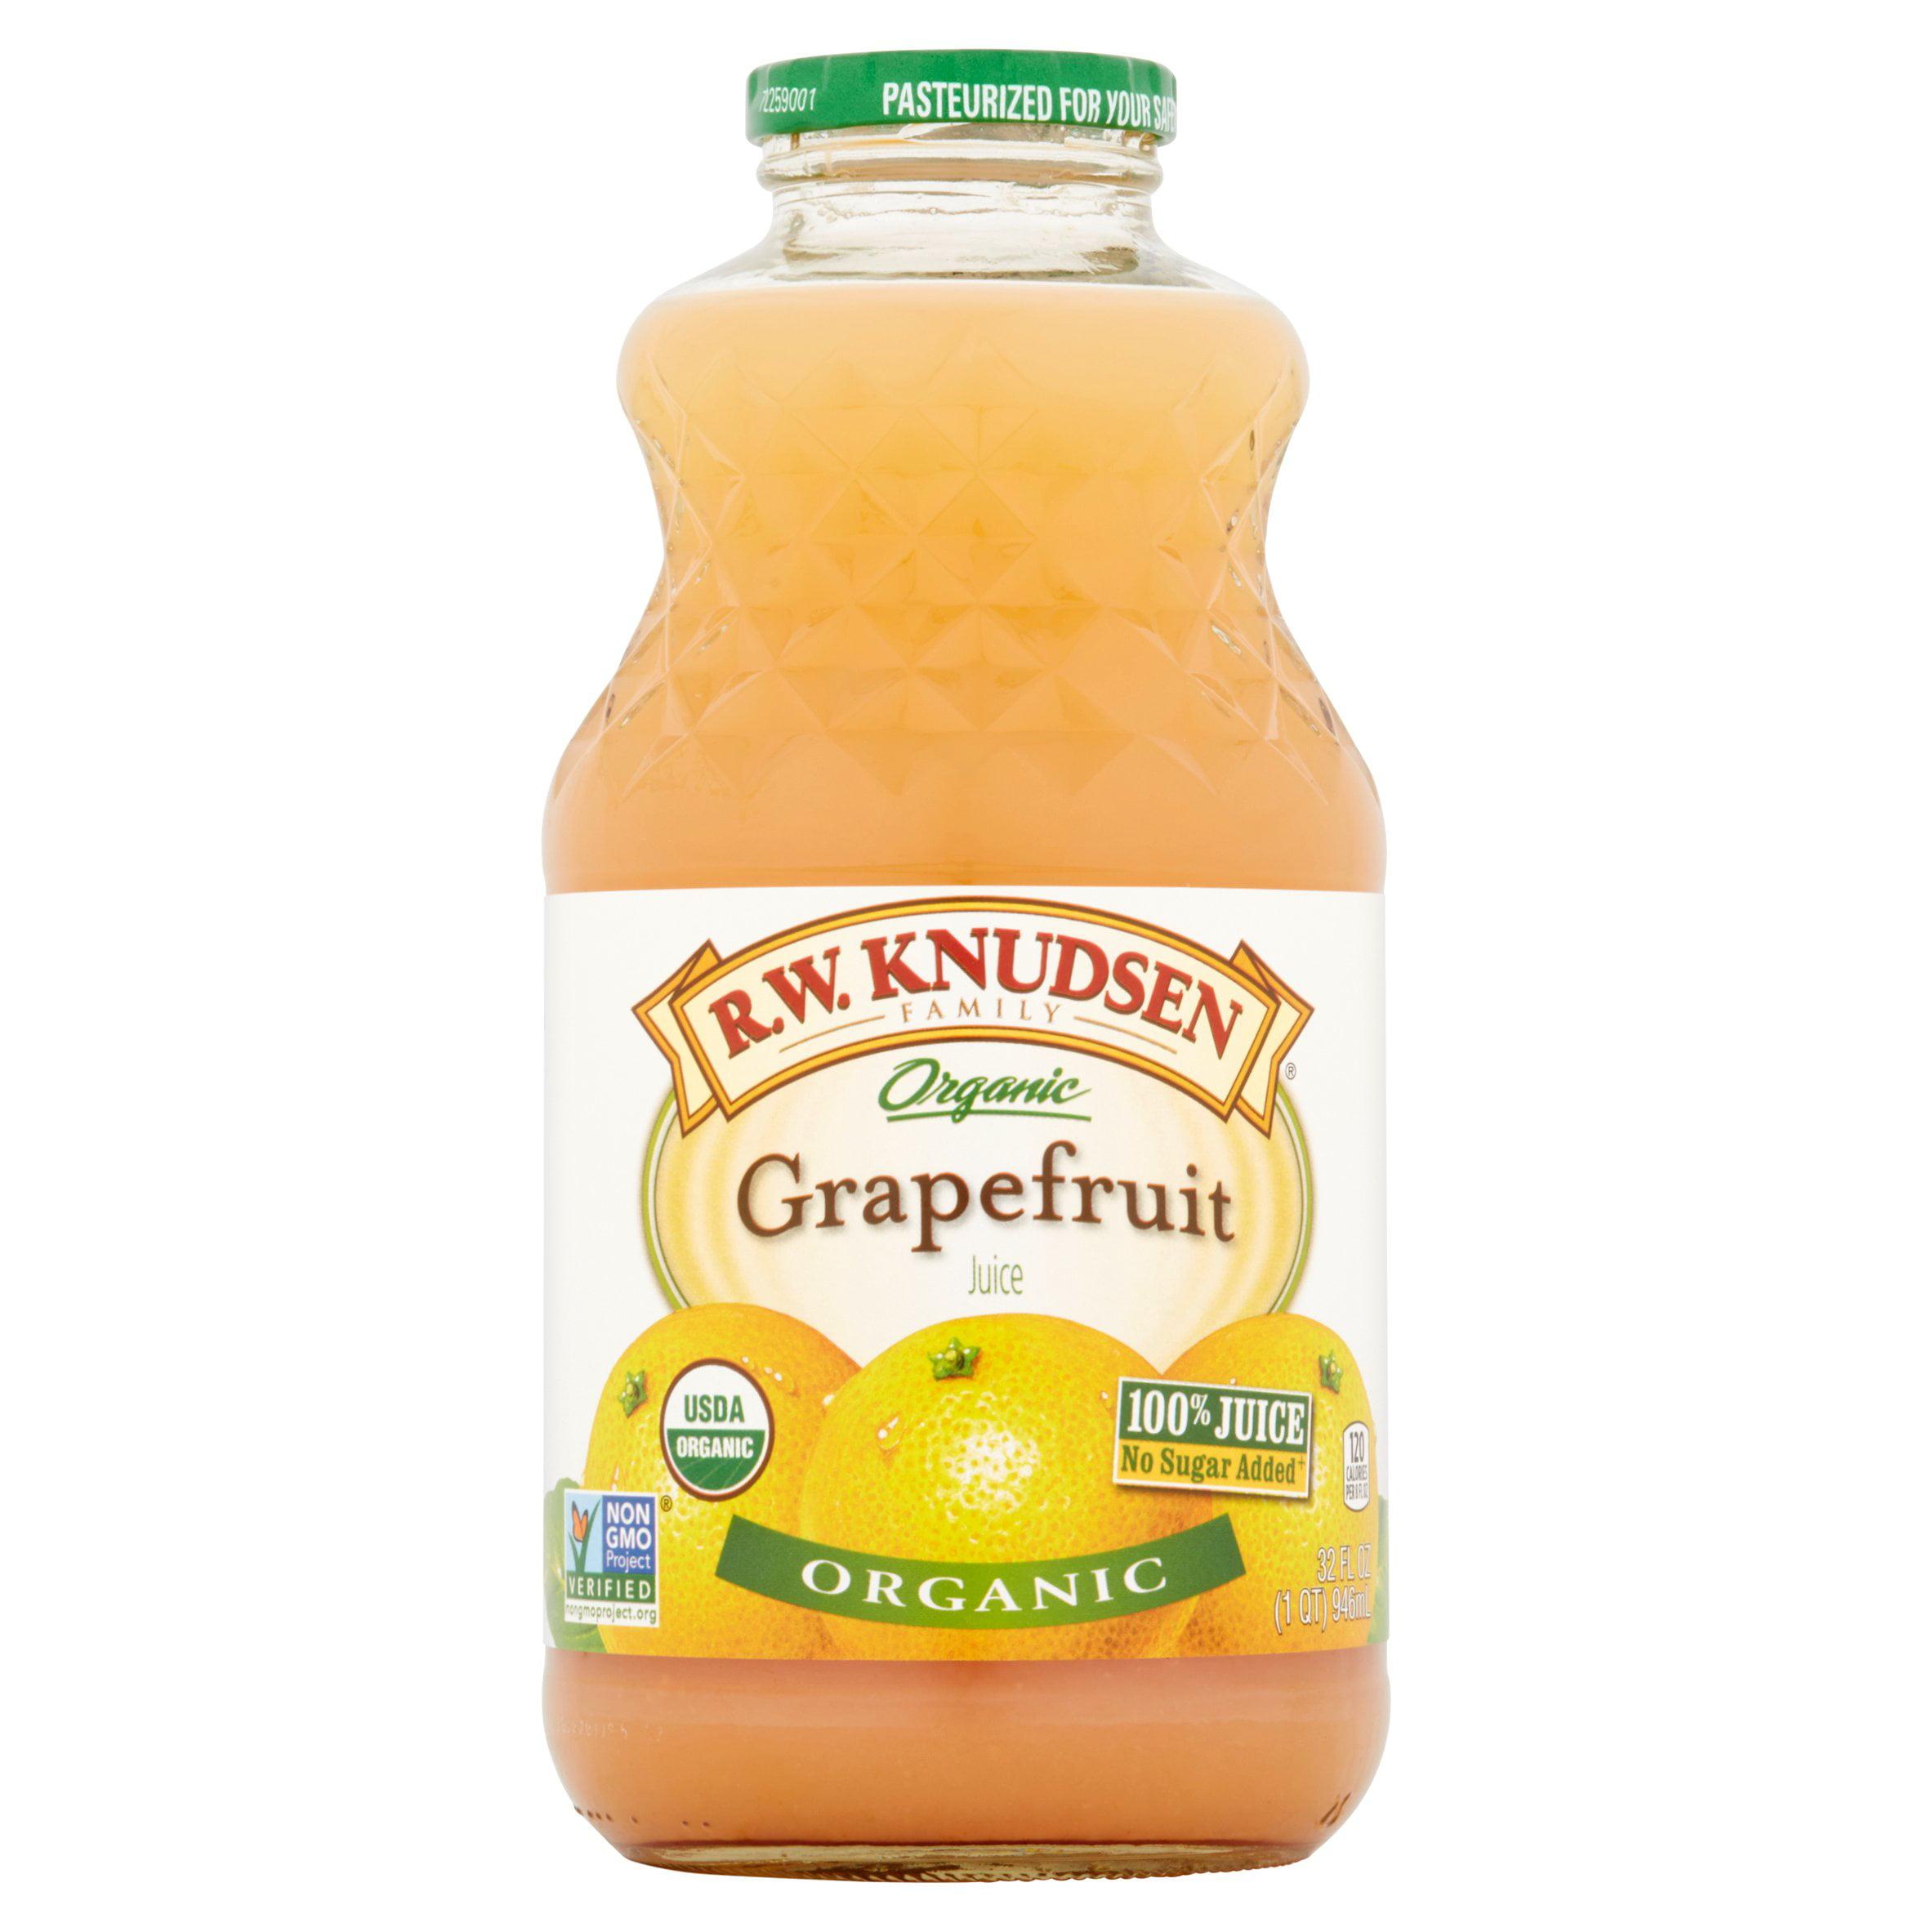 R.W. Knudsen Organic Grapefruit Juice, 32.0 FL OZ by Knudsen & Sons, Inc.